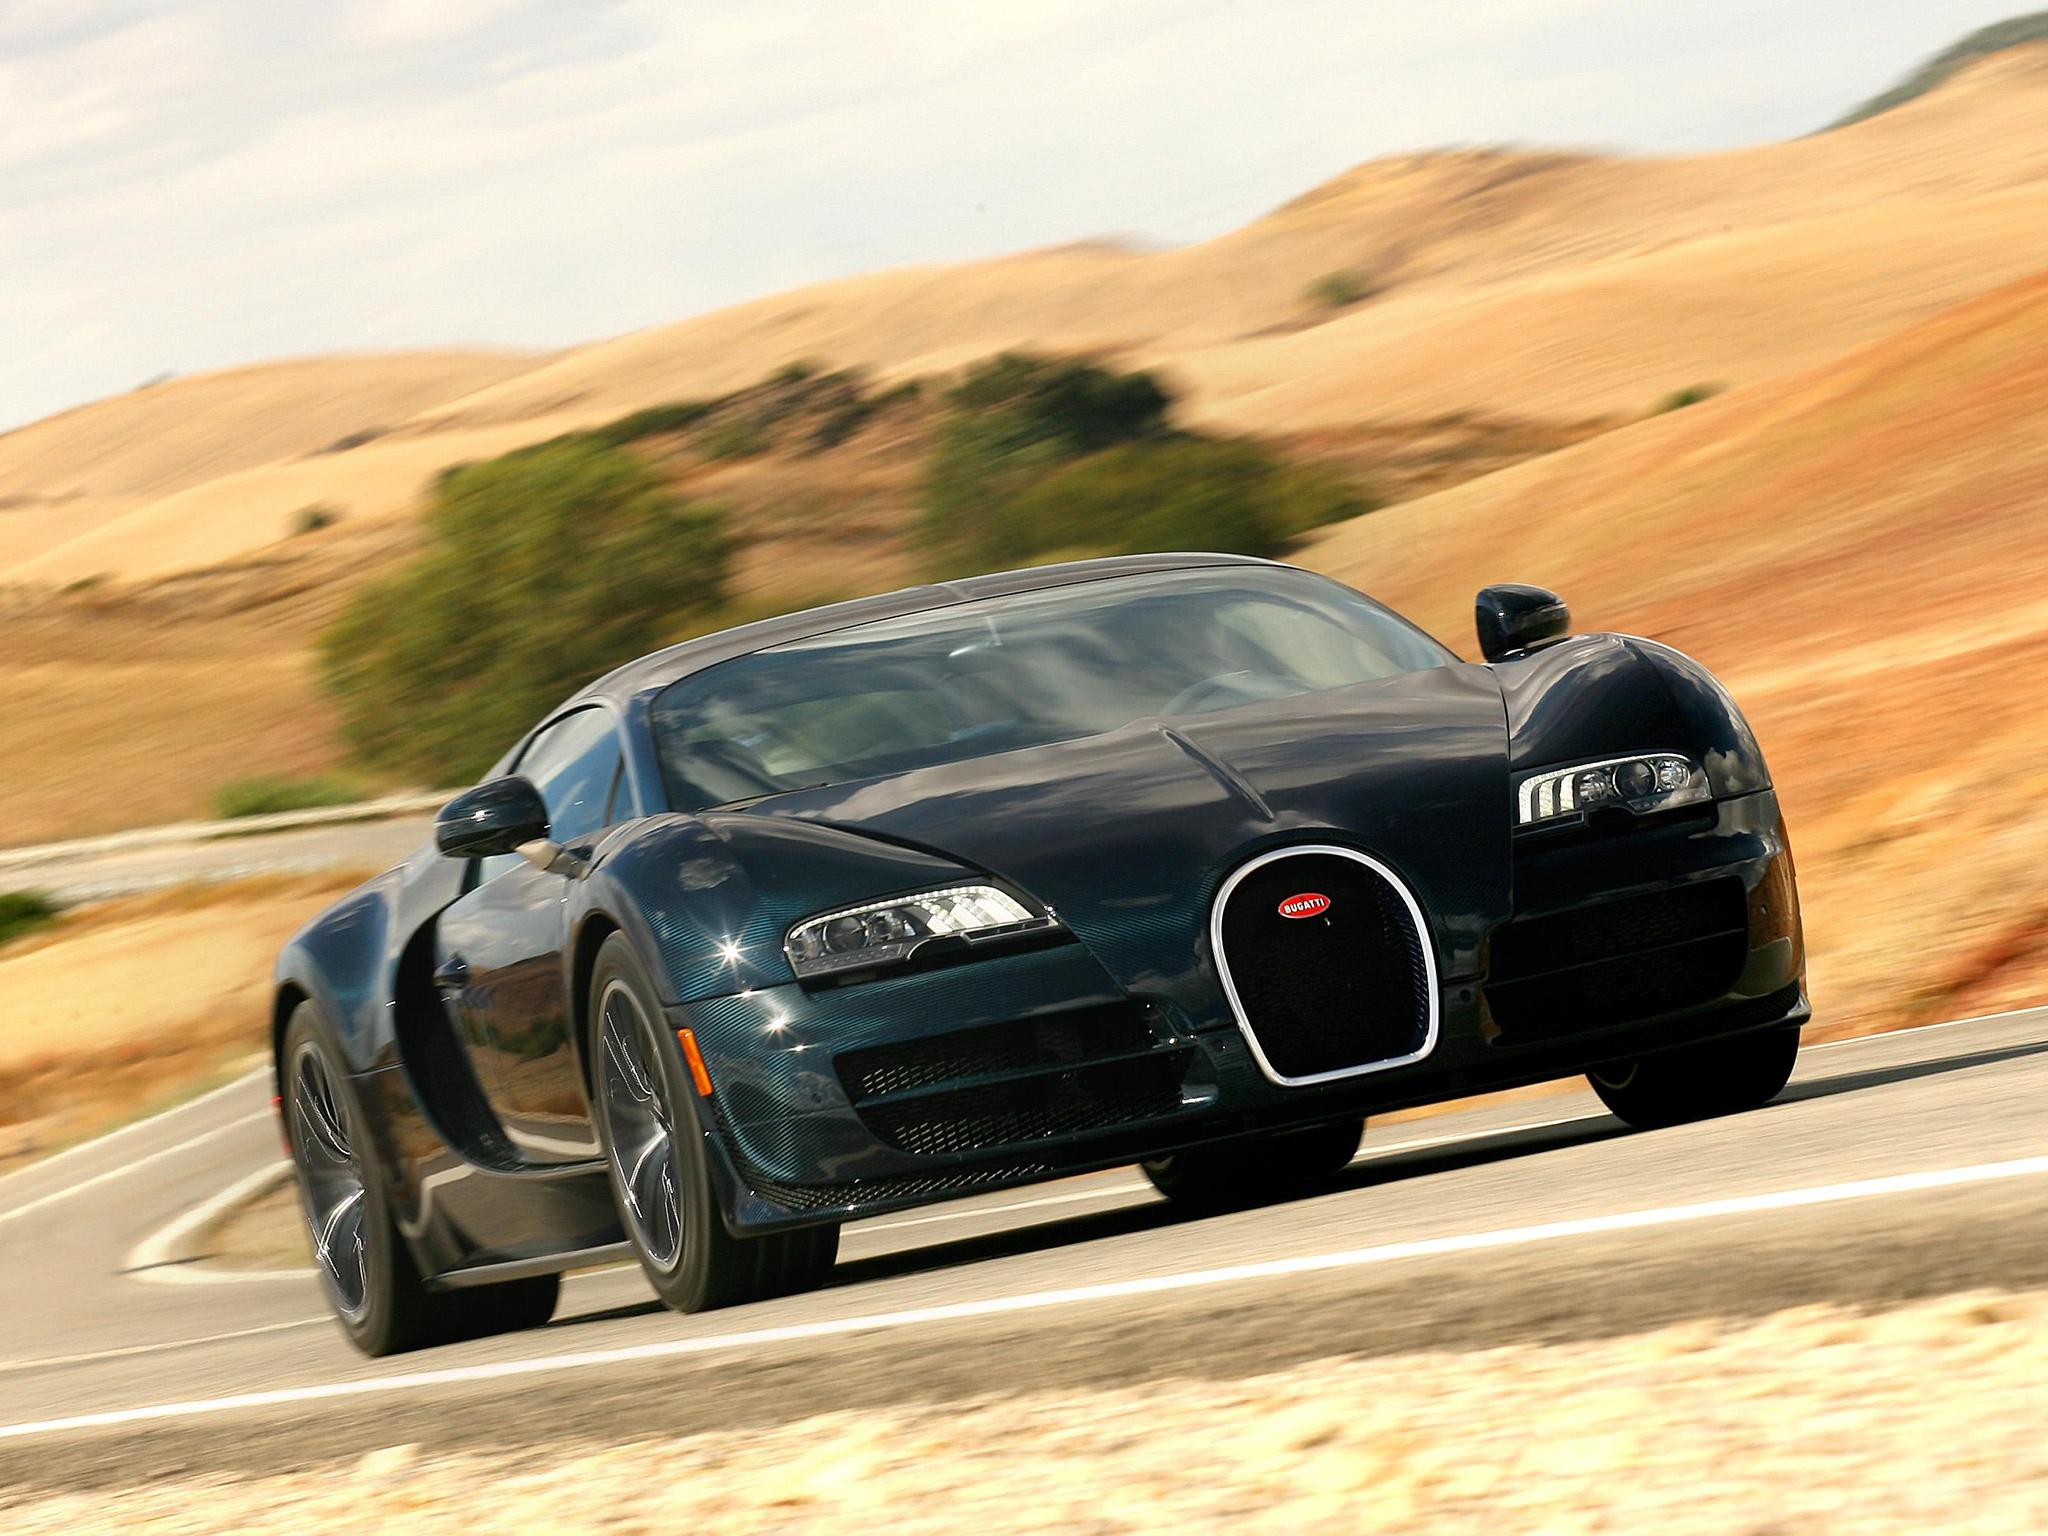 124884 скачать обои Тачки (Cars), Вид Спереди, Спорткар, Bugatti Veyron, 16-4 - заставки и картинки бесплатно